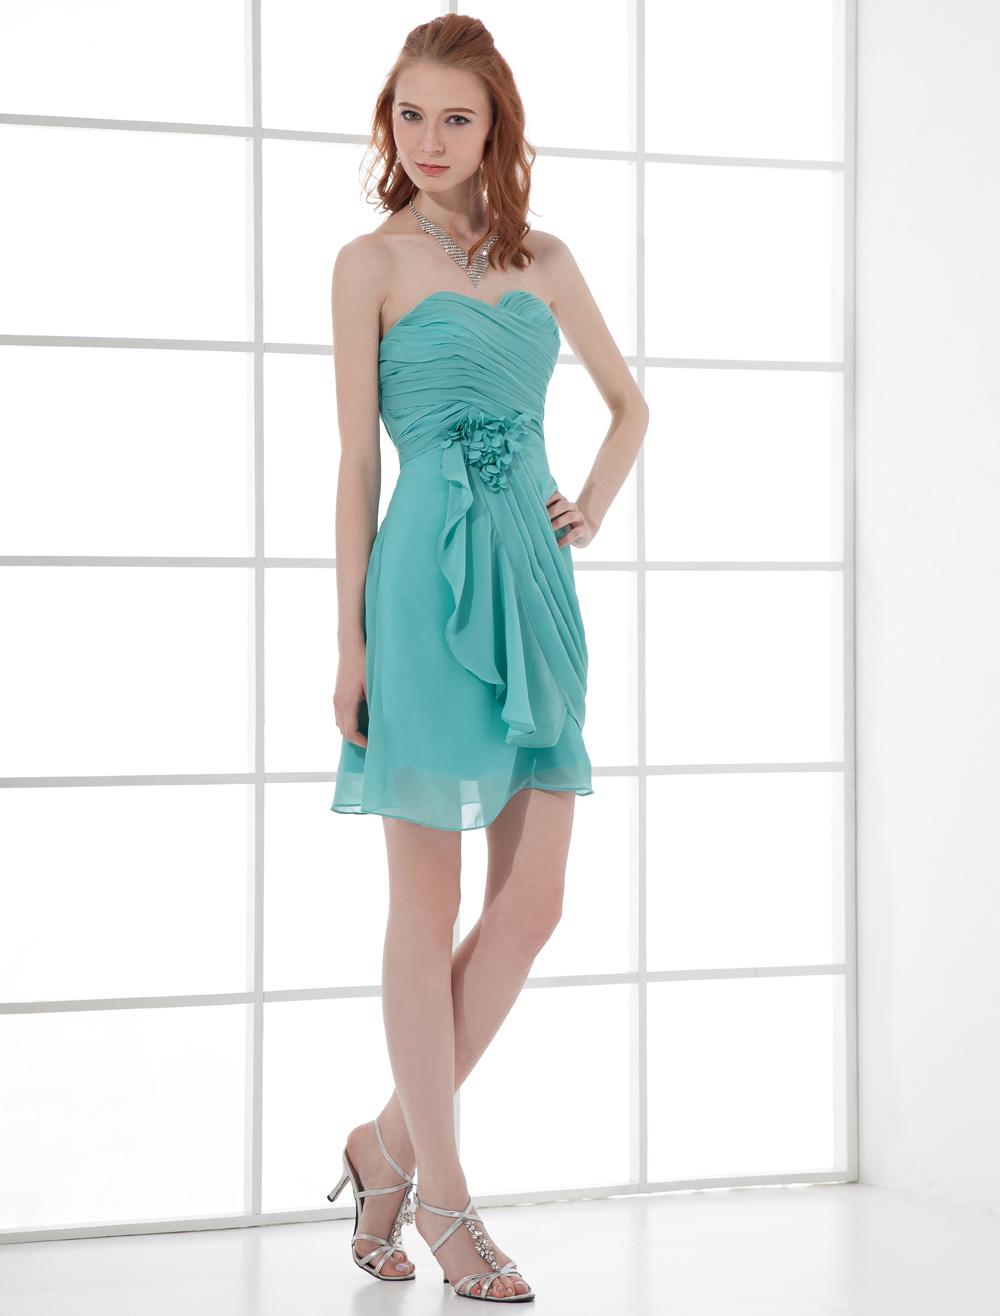 Short Prom Dress Turquoise Chiffon Strapless Sweetheart Cocktail Dress Cascading Ruffle Draped Mini Homecoming Dress